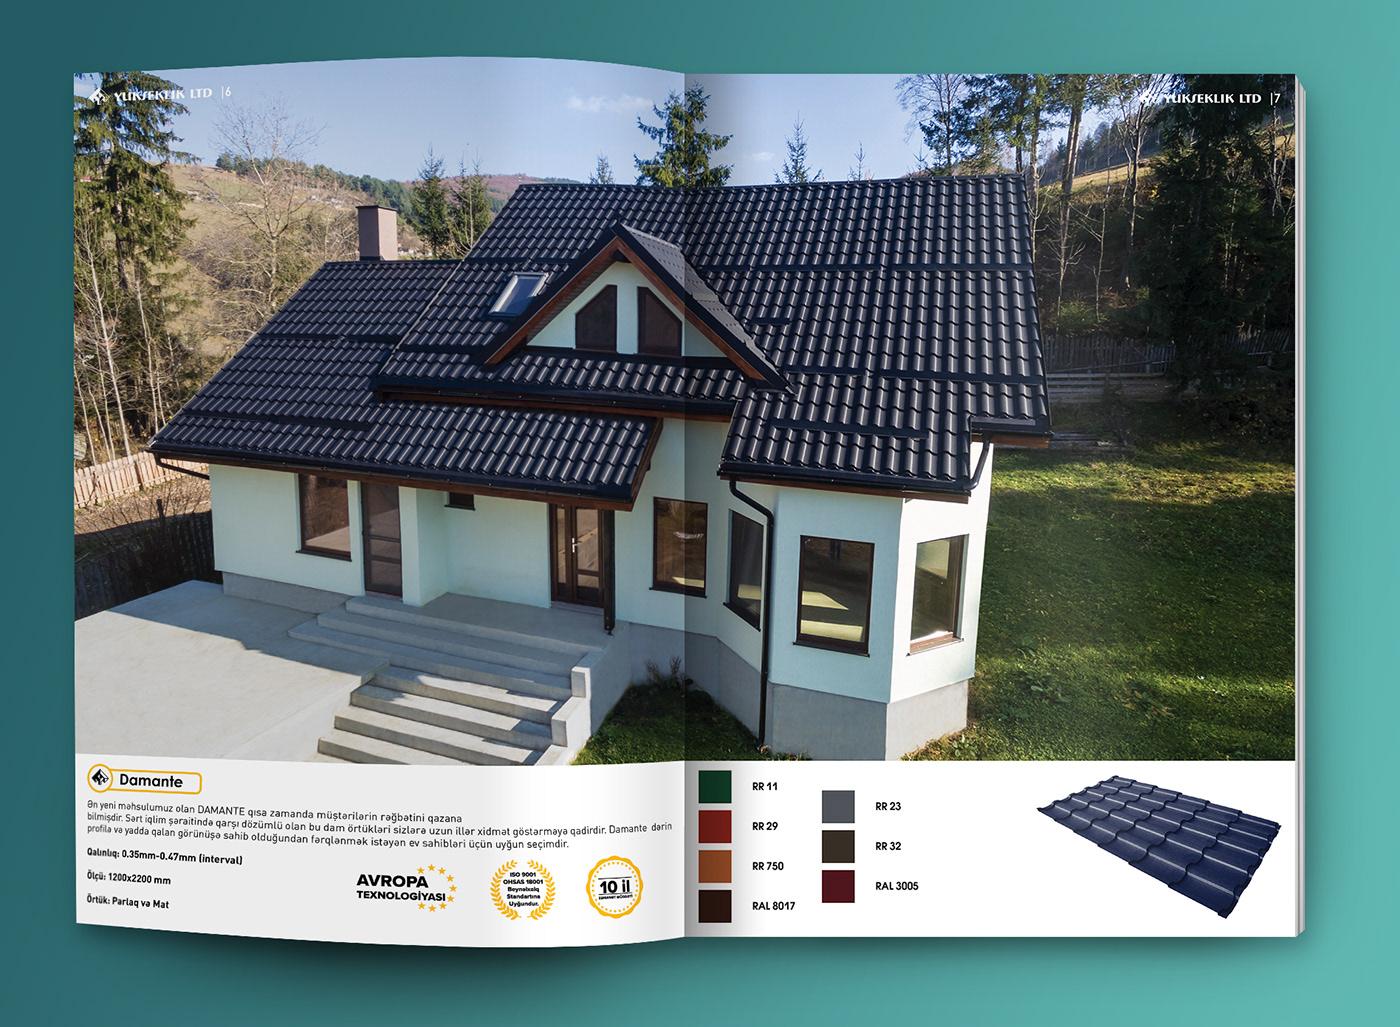 Catalogue InDesign magazine journal roof azerbaijan baku Azerbaycan baki agency